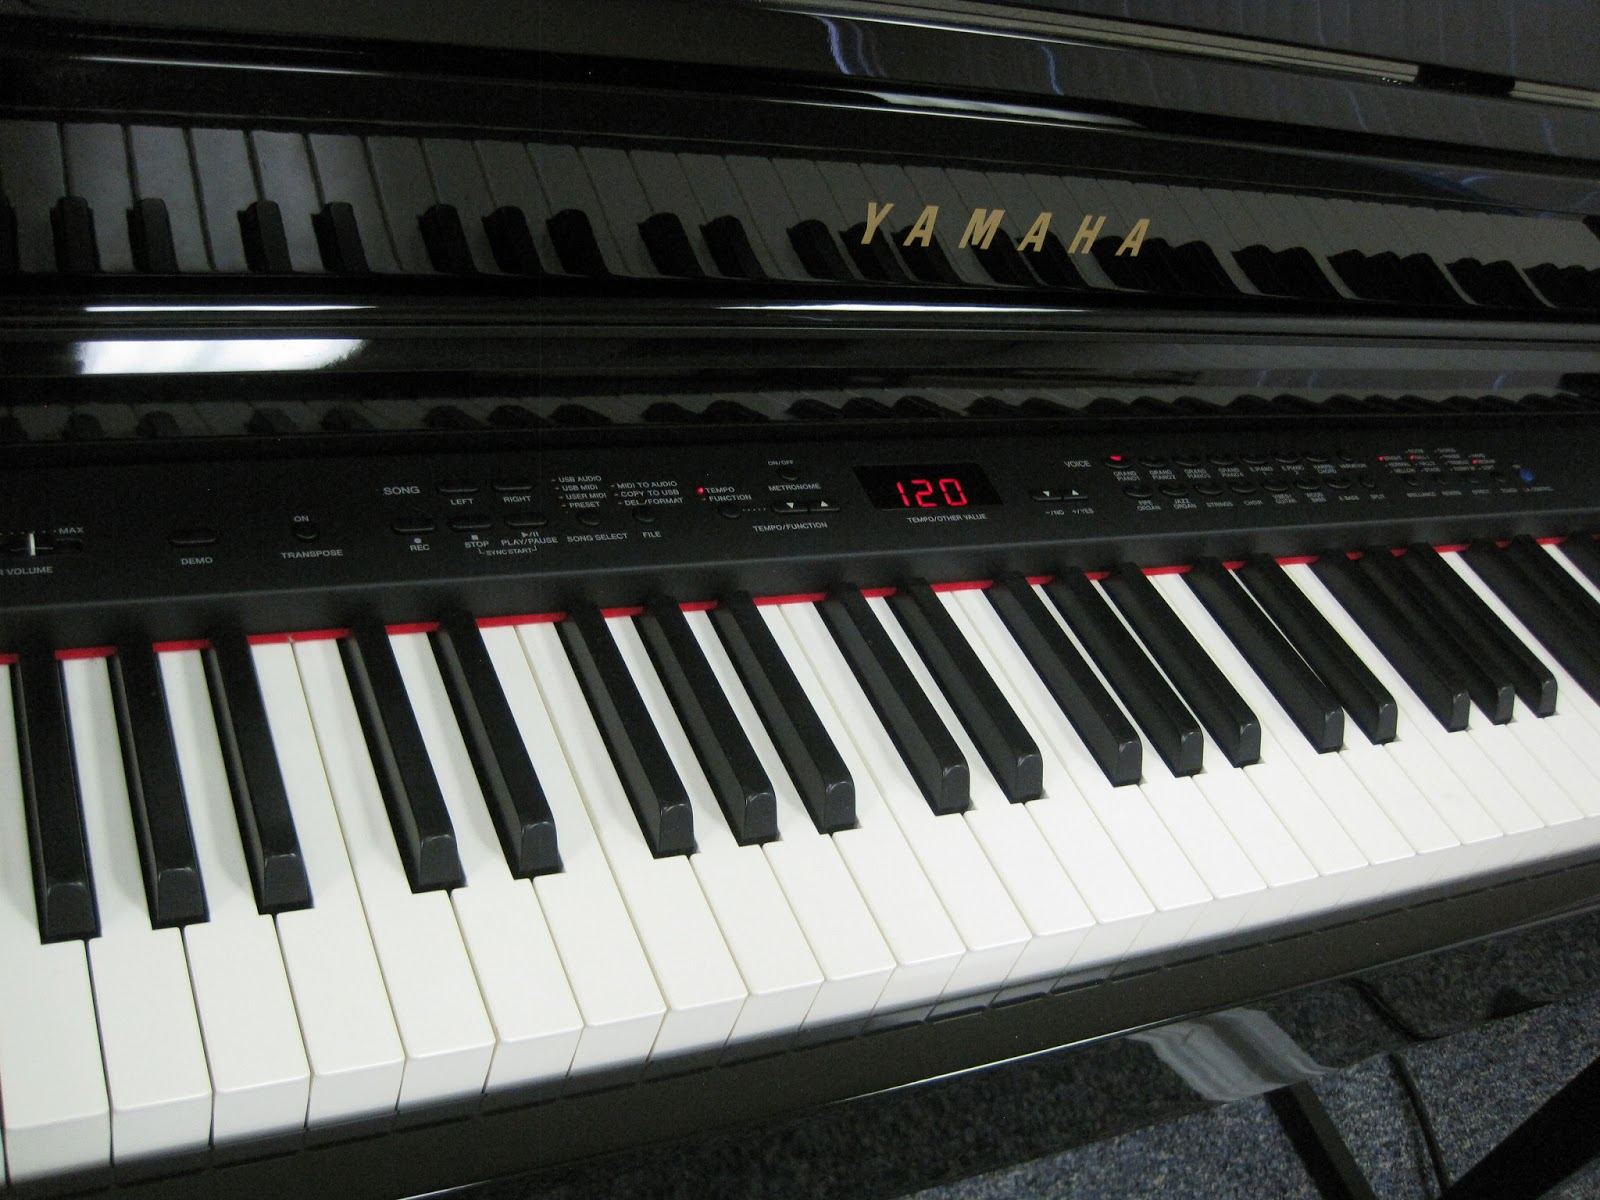 Yamaha clavinova electric piano prices car interior design for Yamaha piano cost